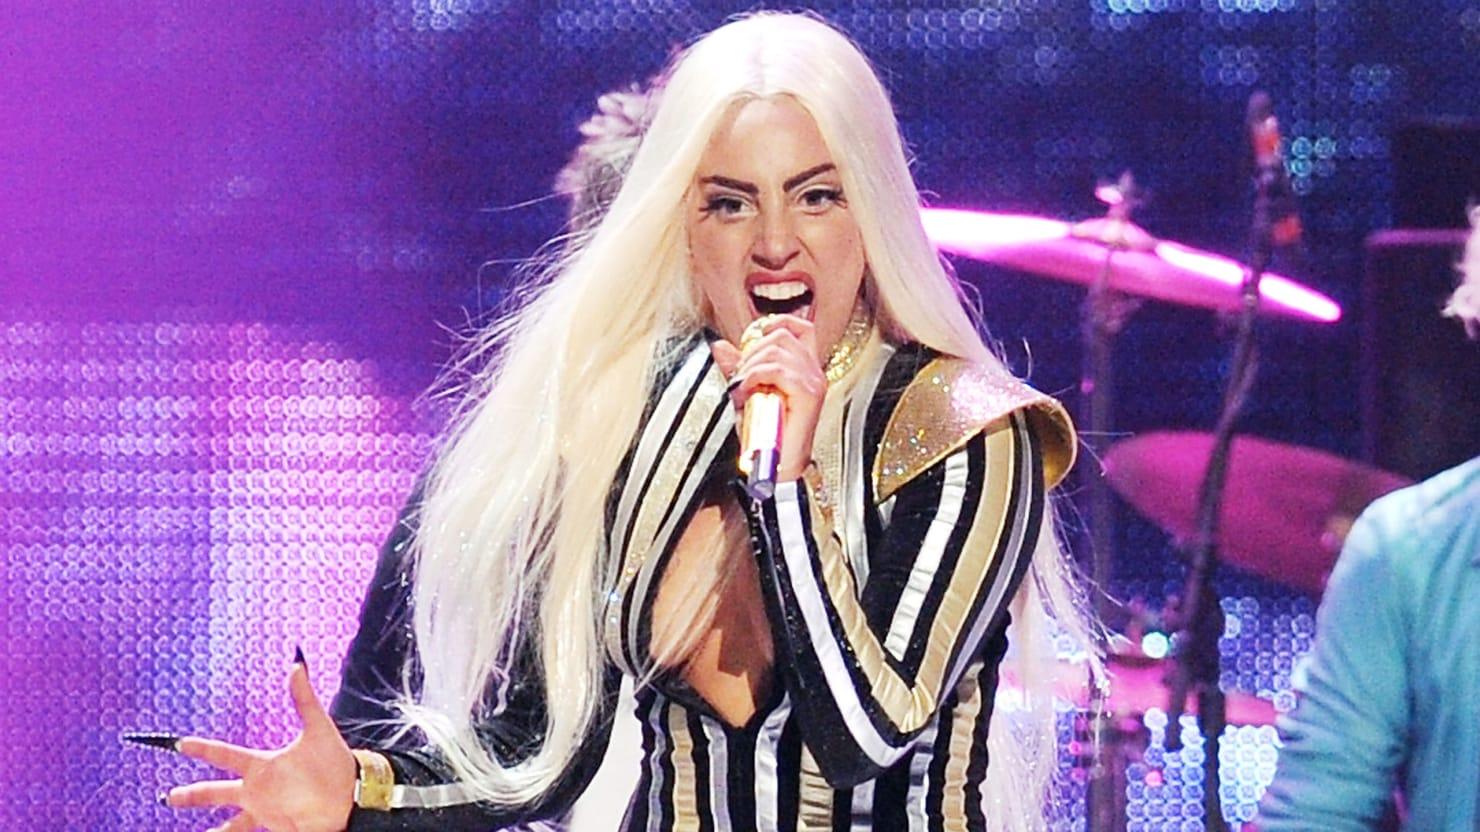 Lady Gaga will record a track with David Guetta 04.09.2009 23